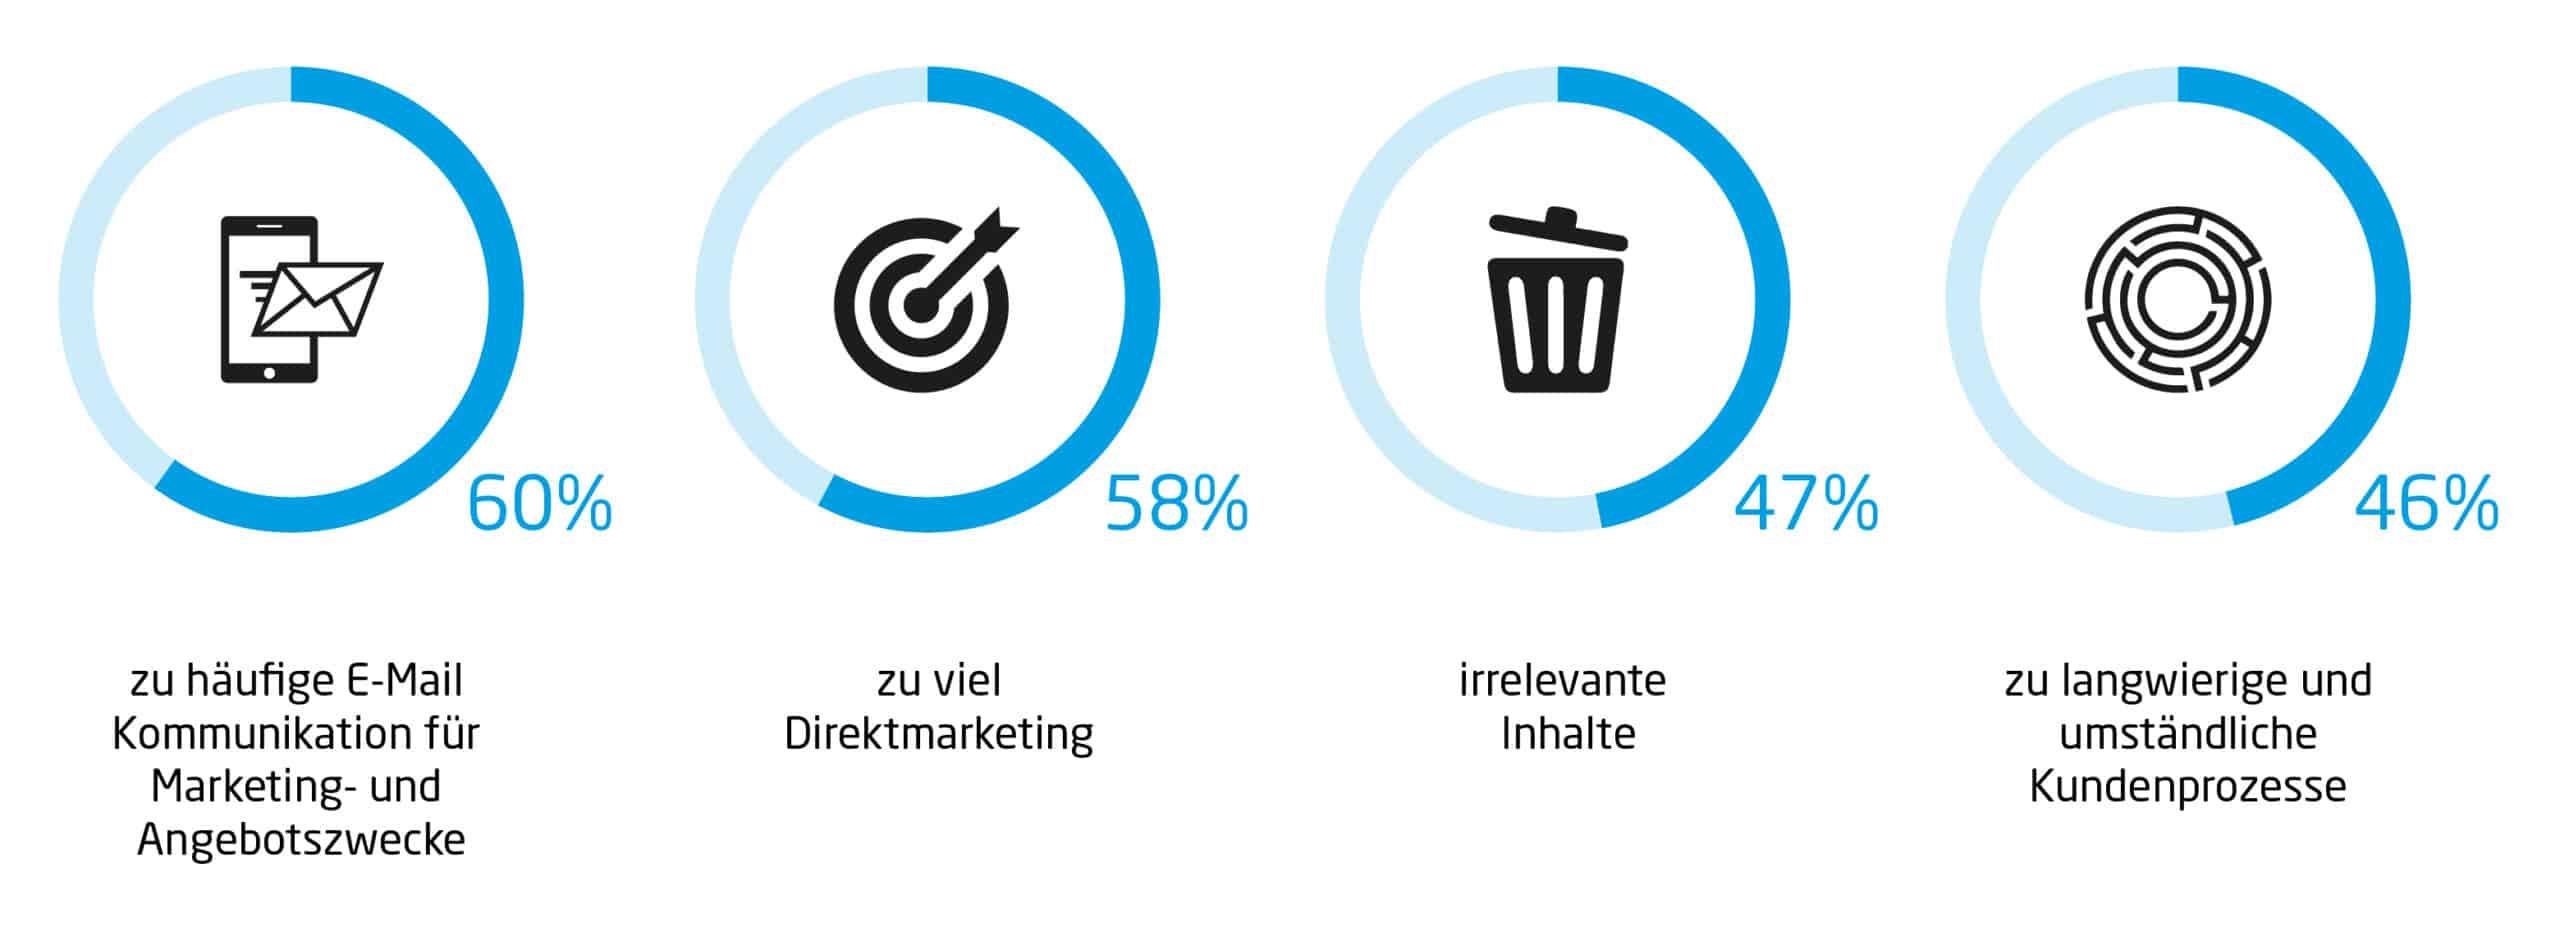 Negativfaktoren Digital Customer Experience